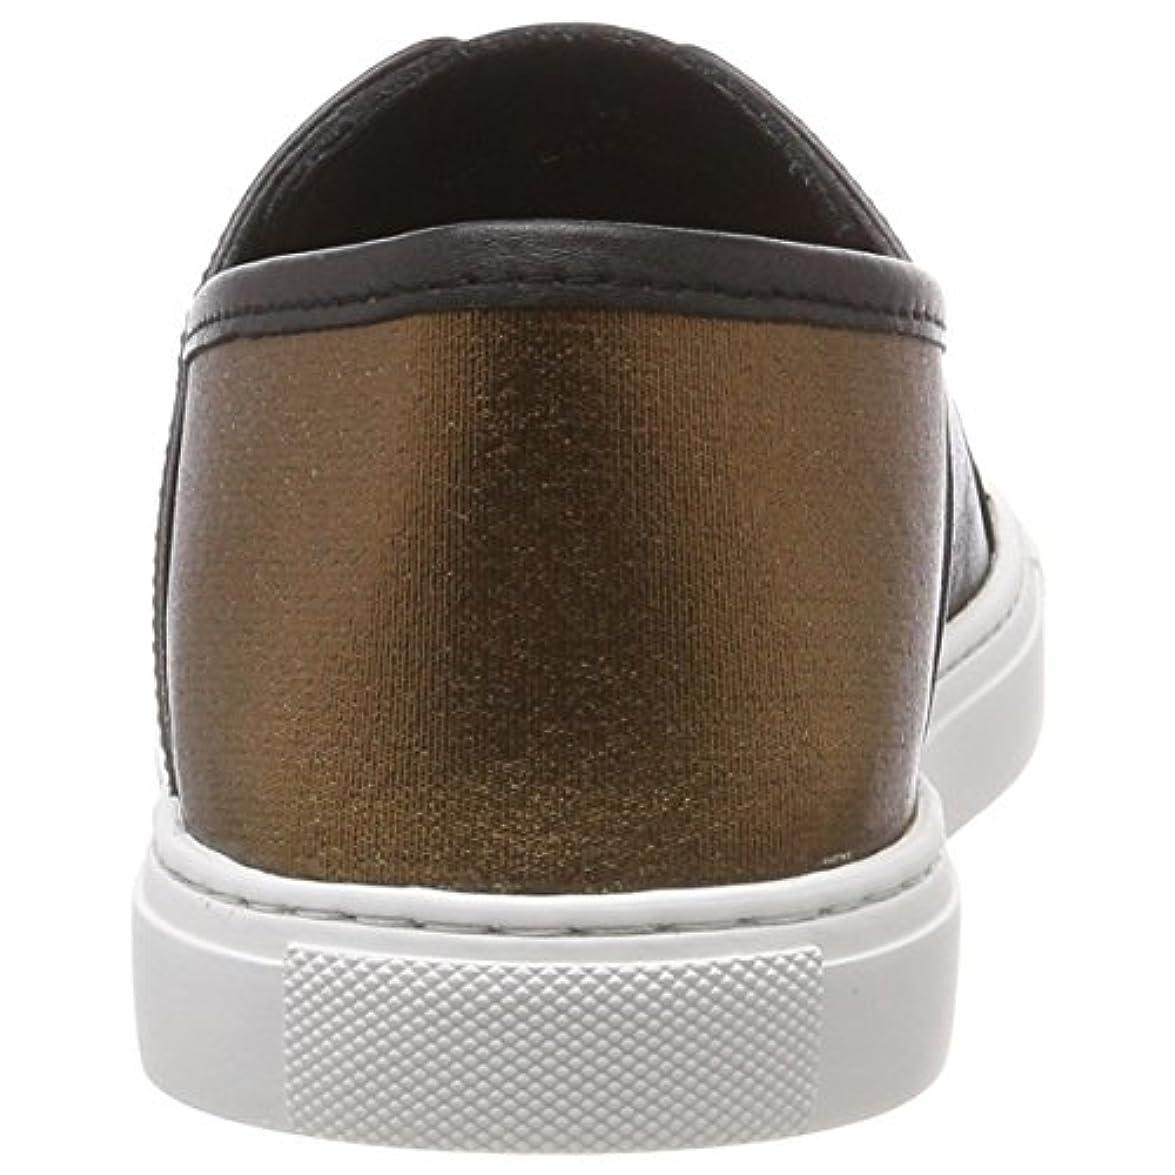 Liebeskind Berlin Ls180340 Nappa Slip-on Sneaker Donna